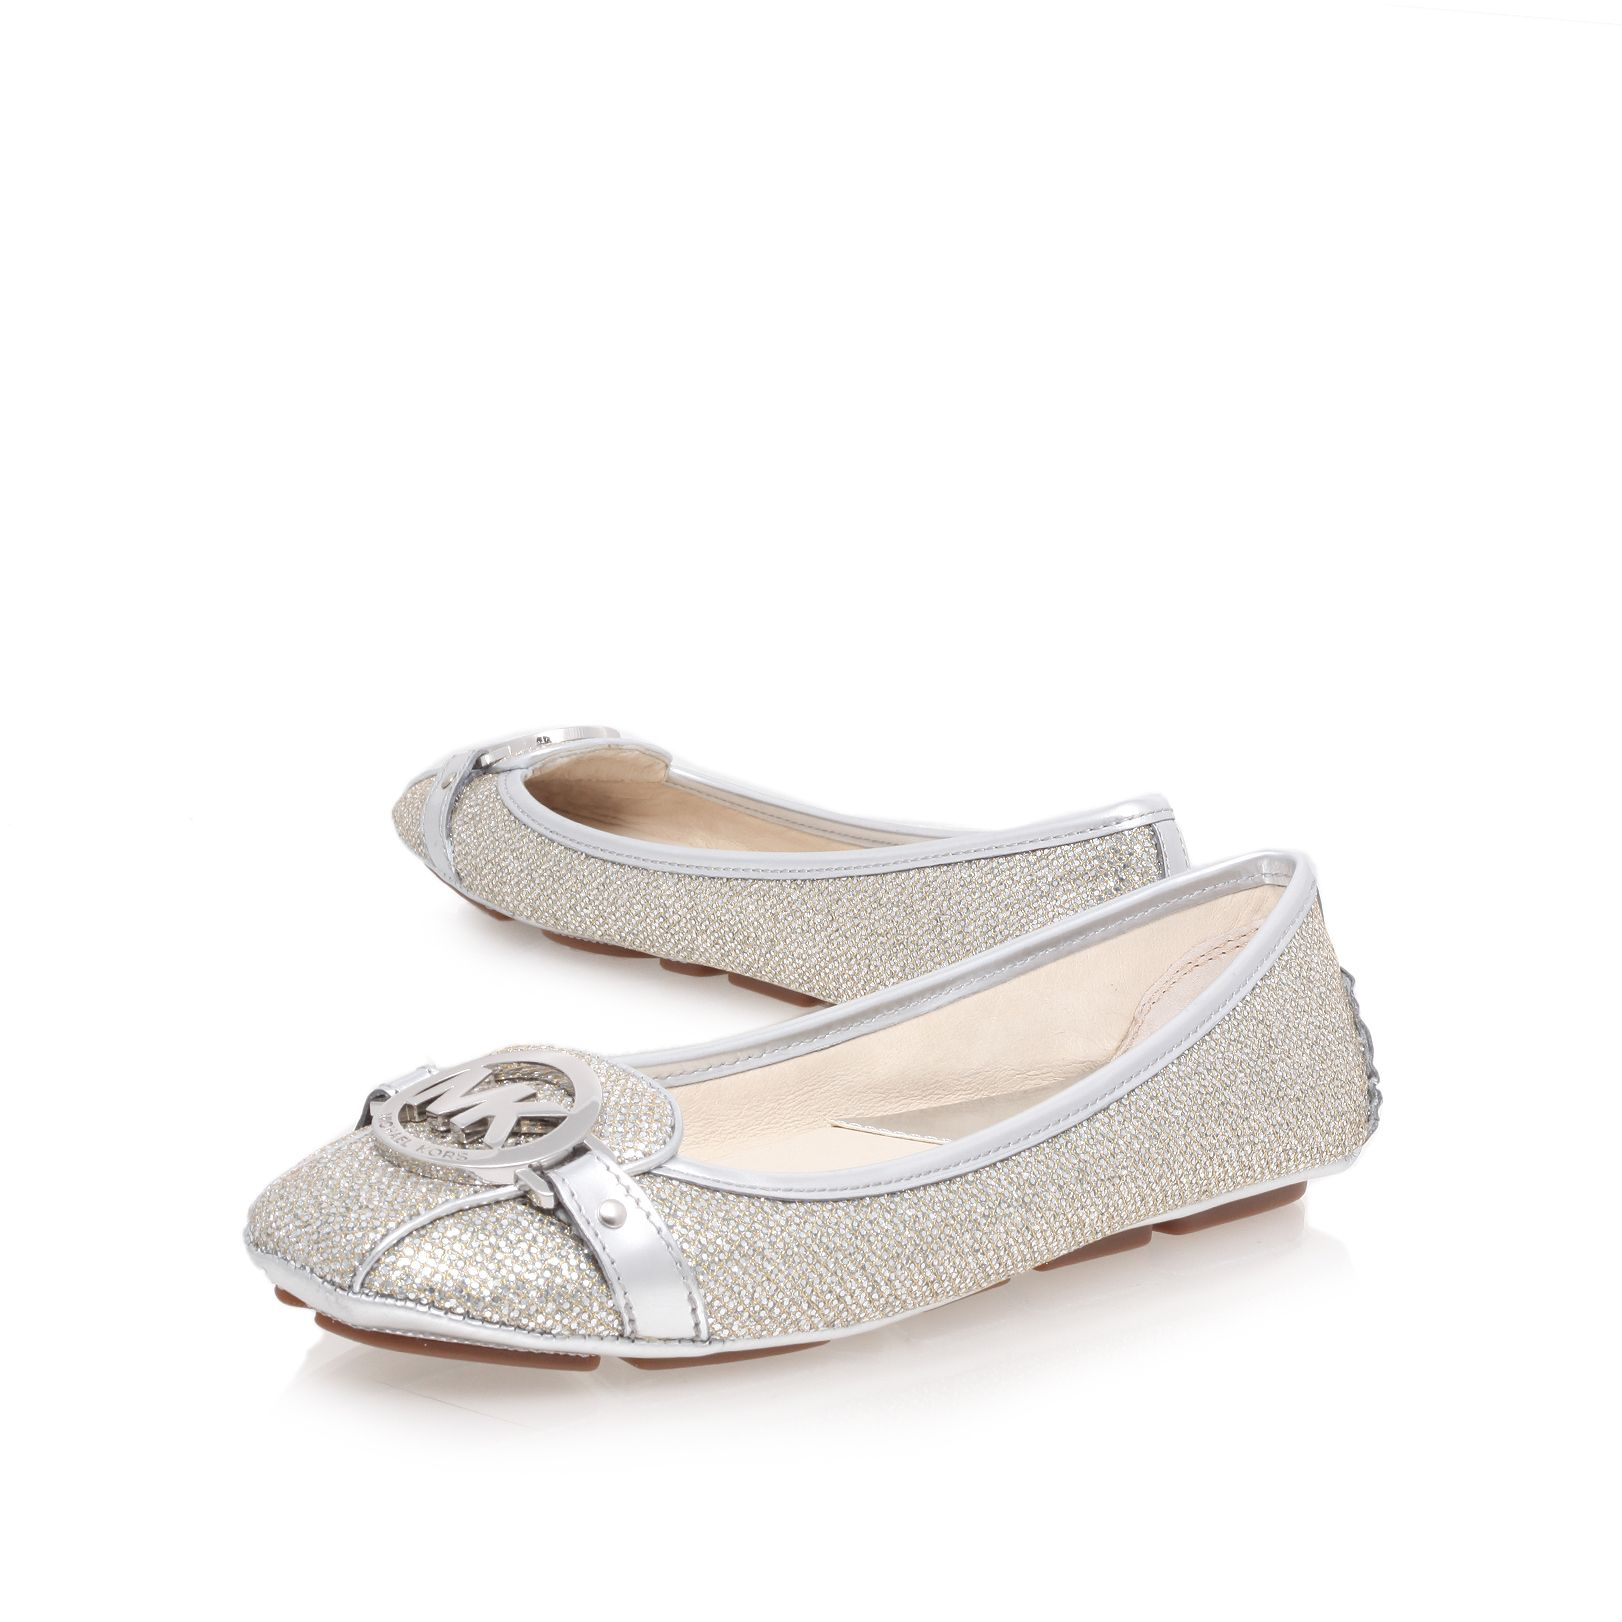 michael kors fulton moc ballerina pump shoes in metallic lyst. Black Bedroom Furniture Sets. Home Design Ideas